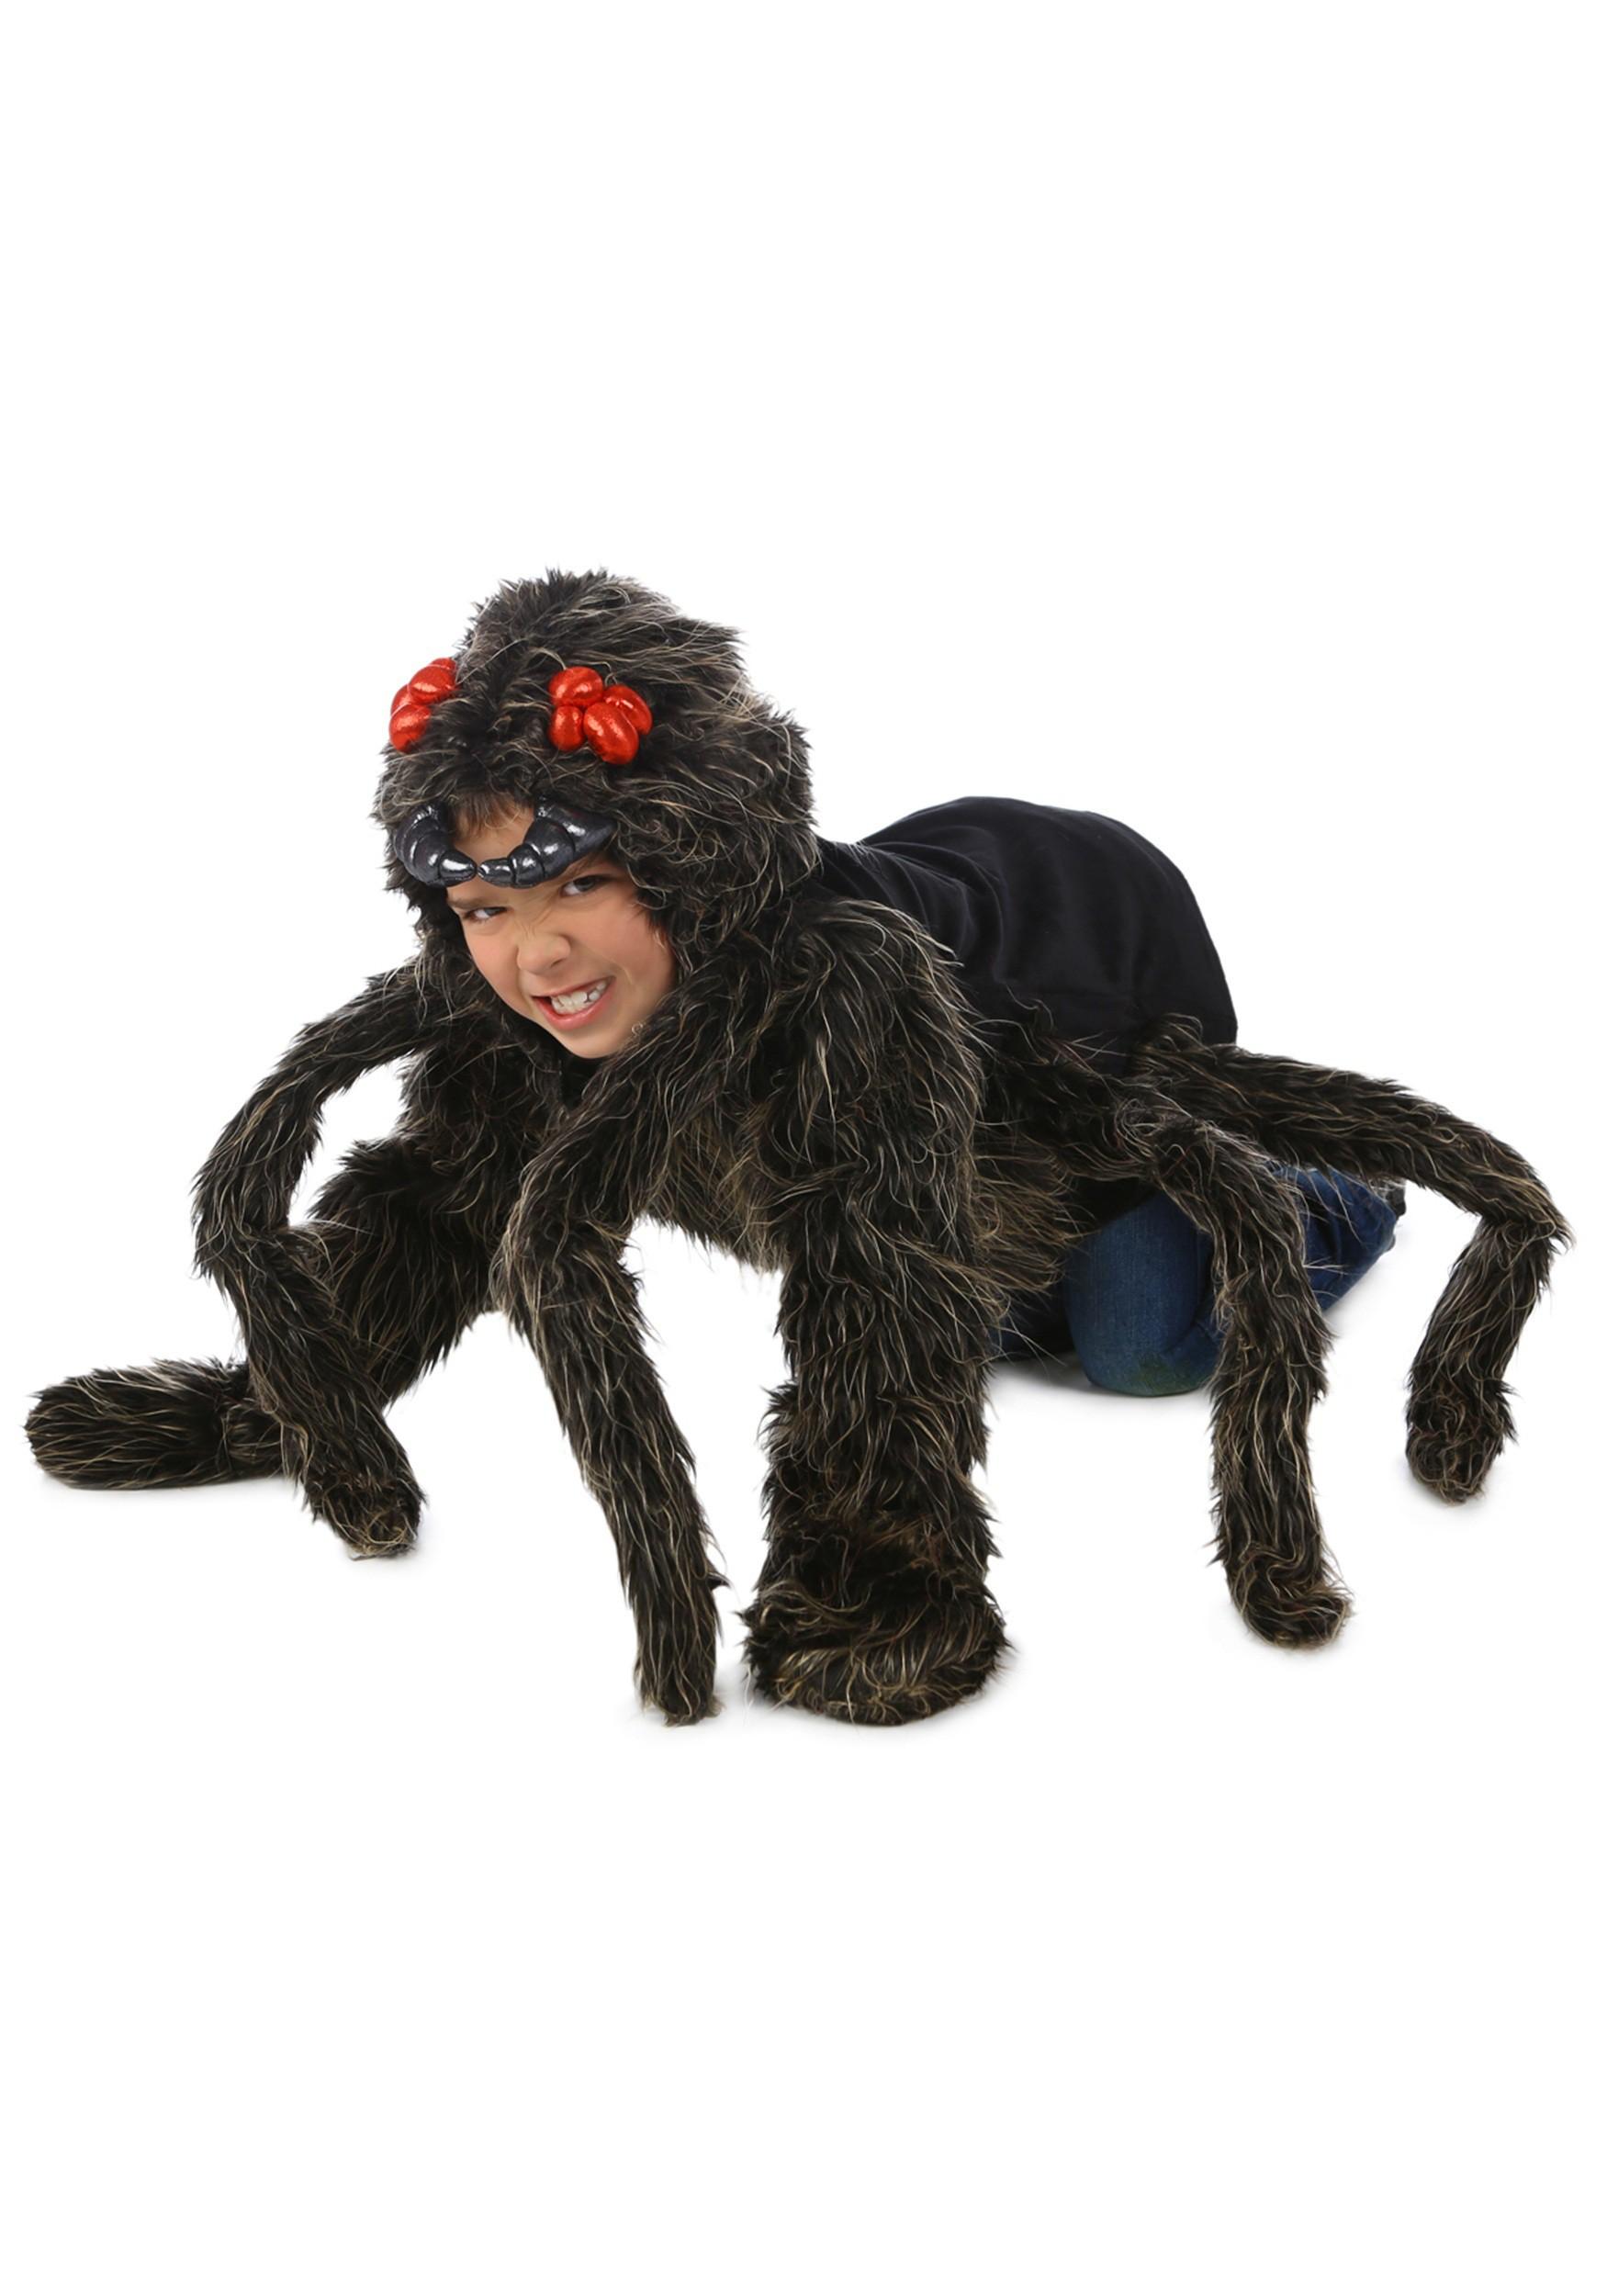 Tarantula Hoodie Costume for Kids